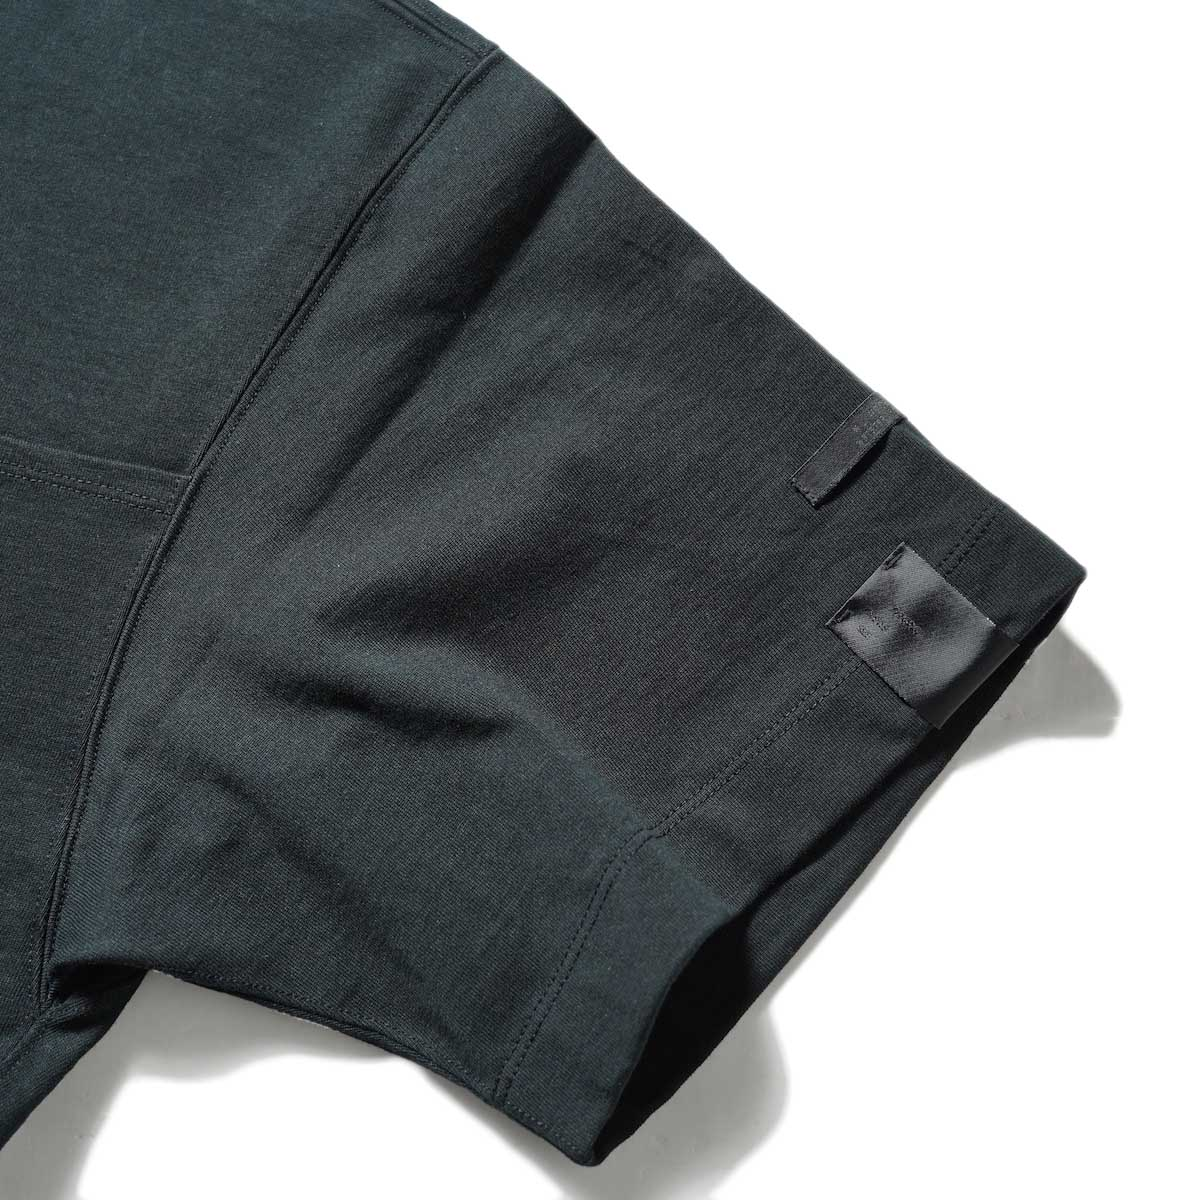 N.HOOLYWOOD / 2212-CS07-018 BIG T-Shirt (Black)左袖